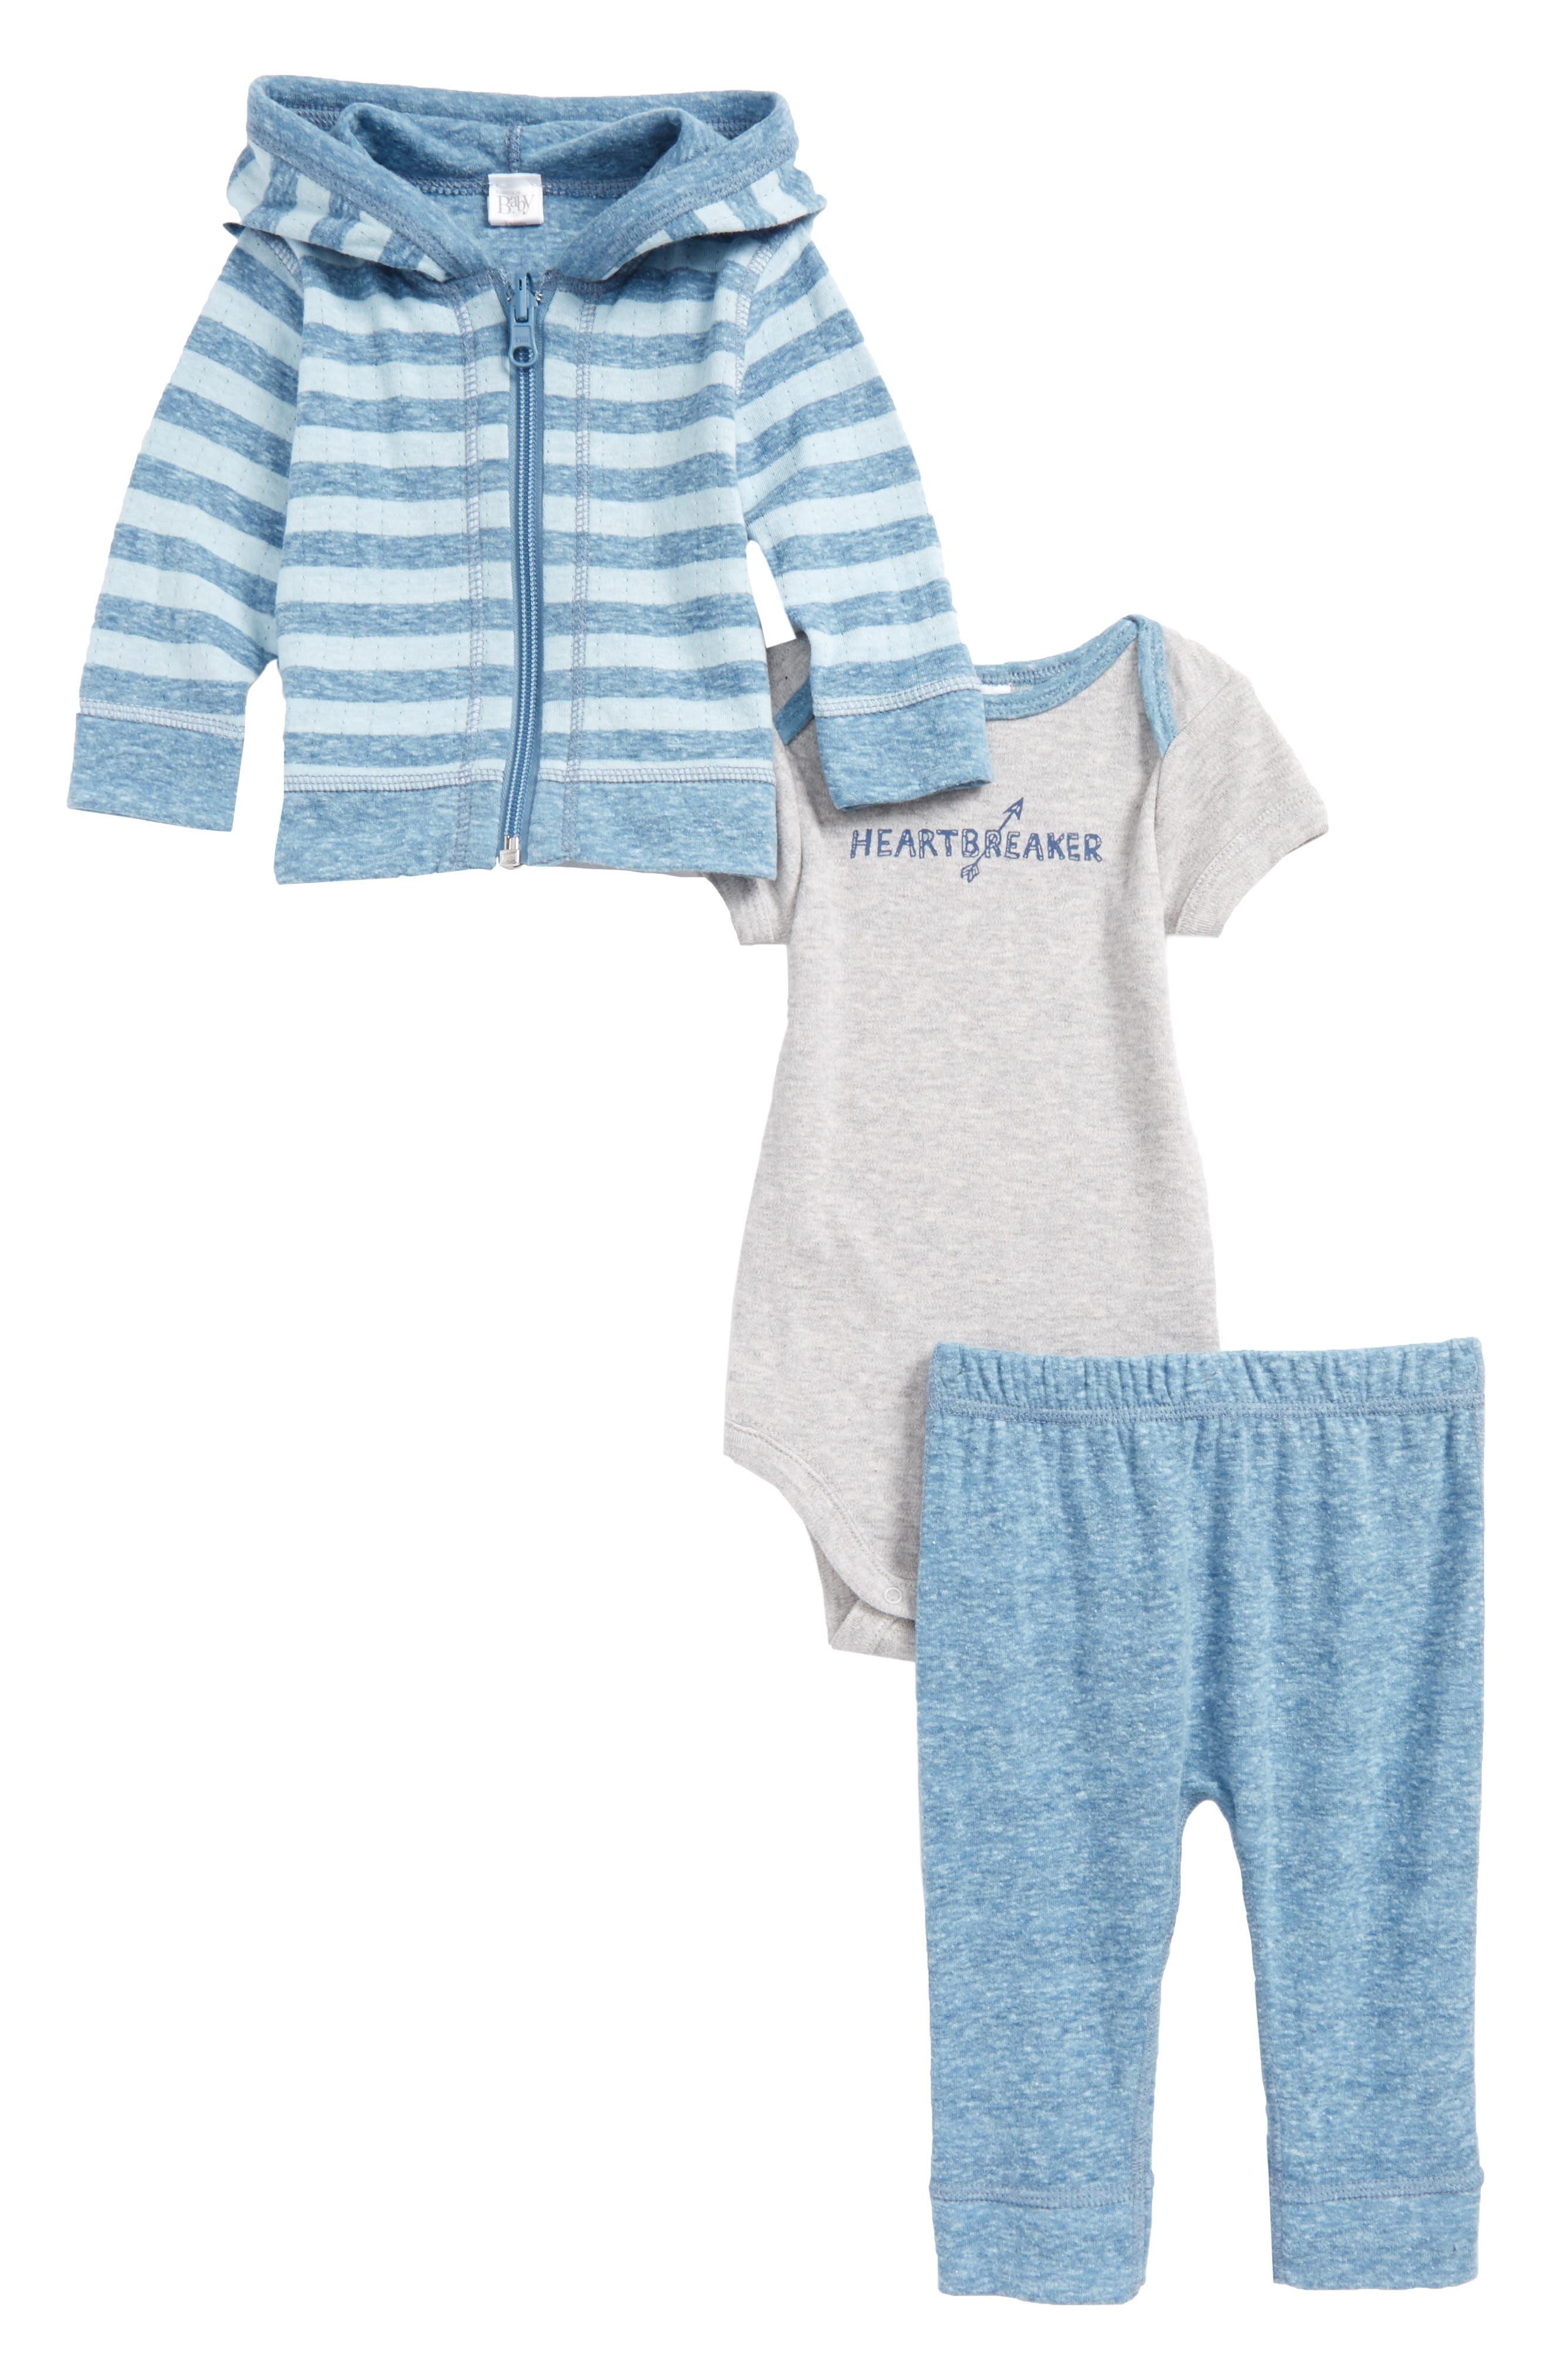 Reversible Zip Hoodie, Bodysuit & Pants Set,                             Main thumbnail 1, color,                             401